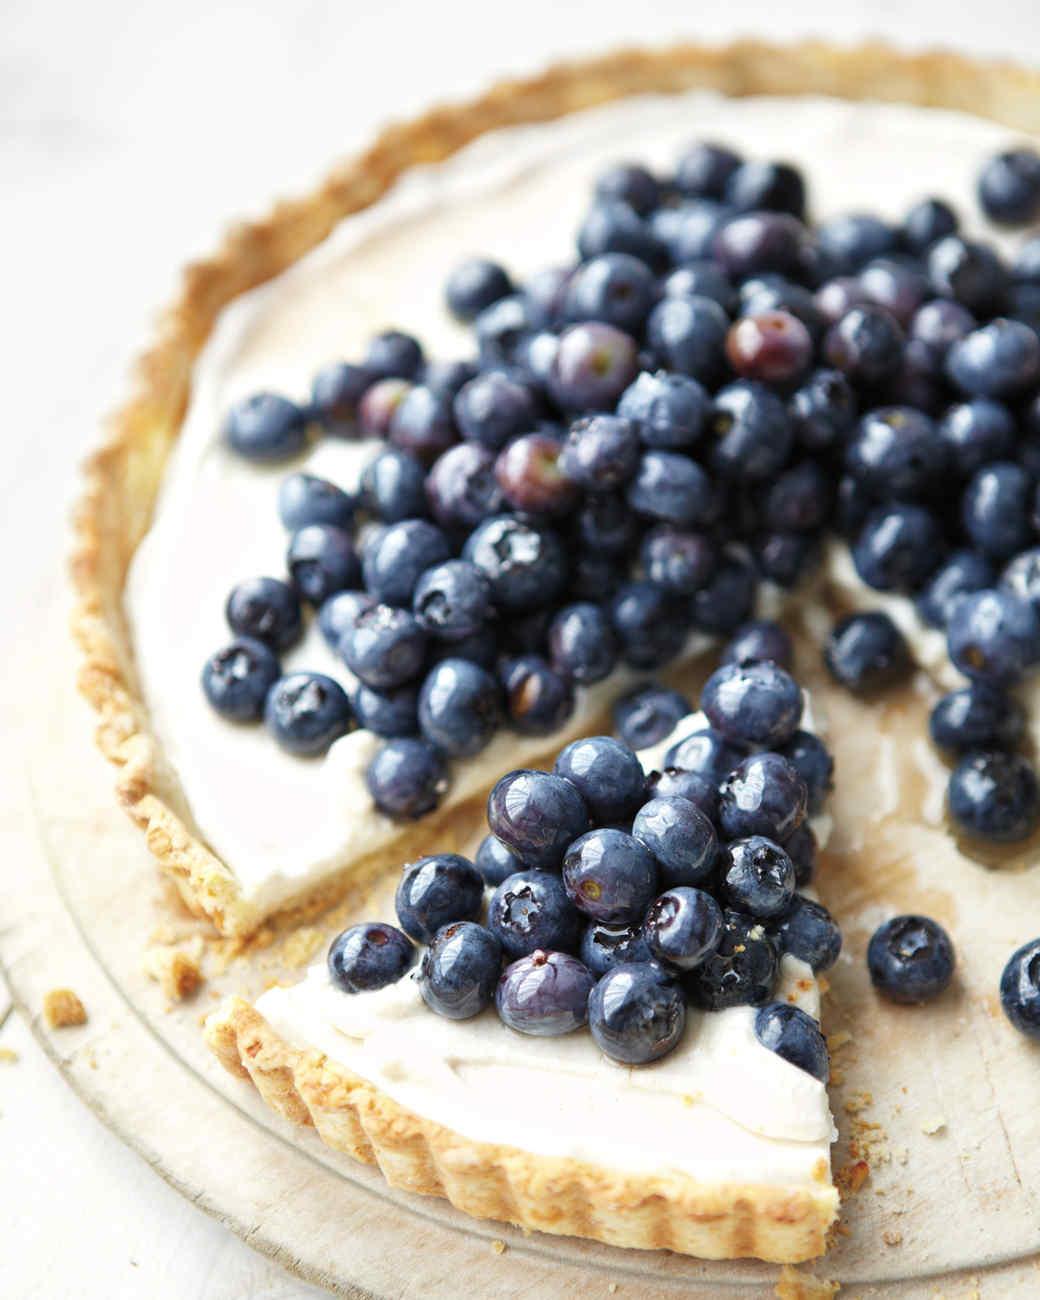 Healthy Fruit Dessert Recipes That Still Feel Indulgent